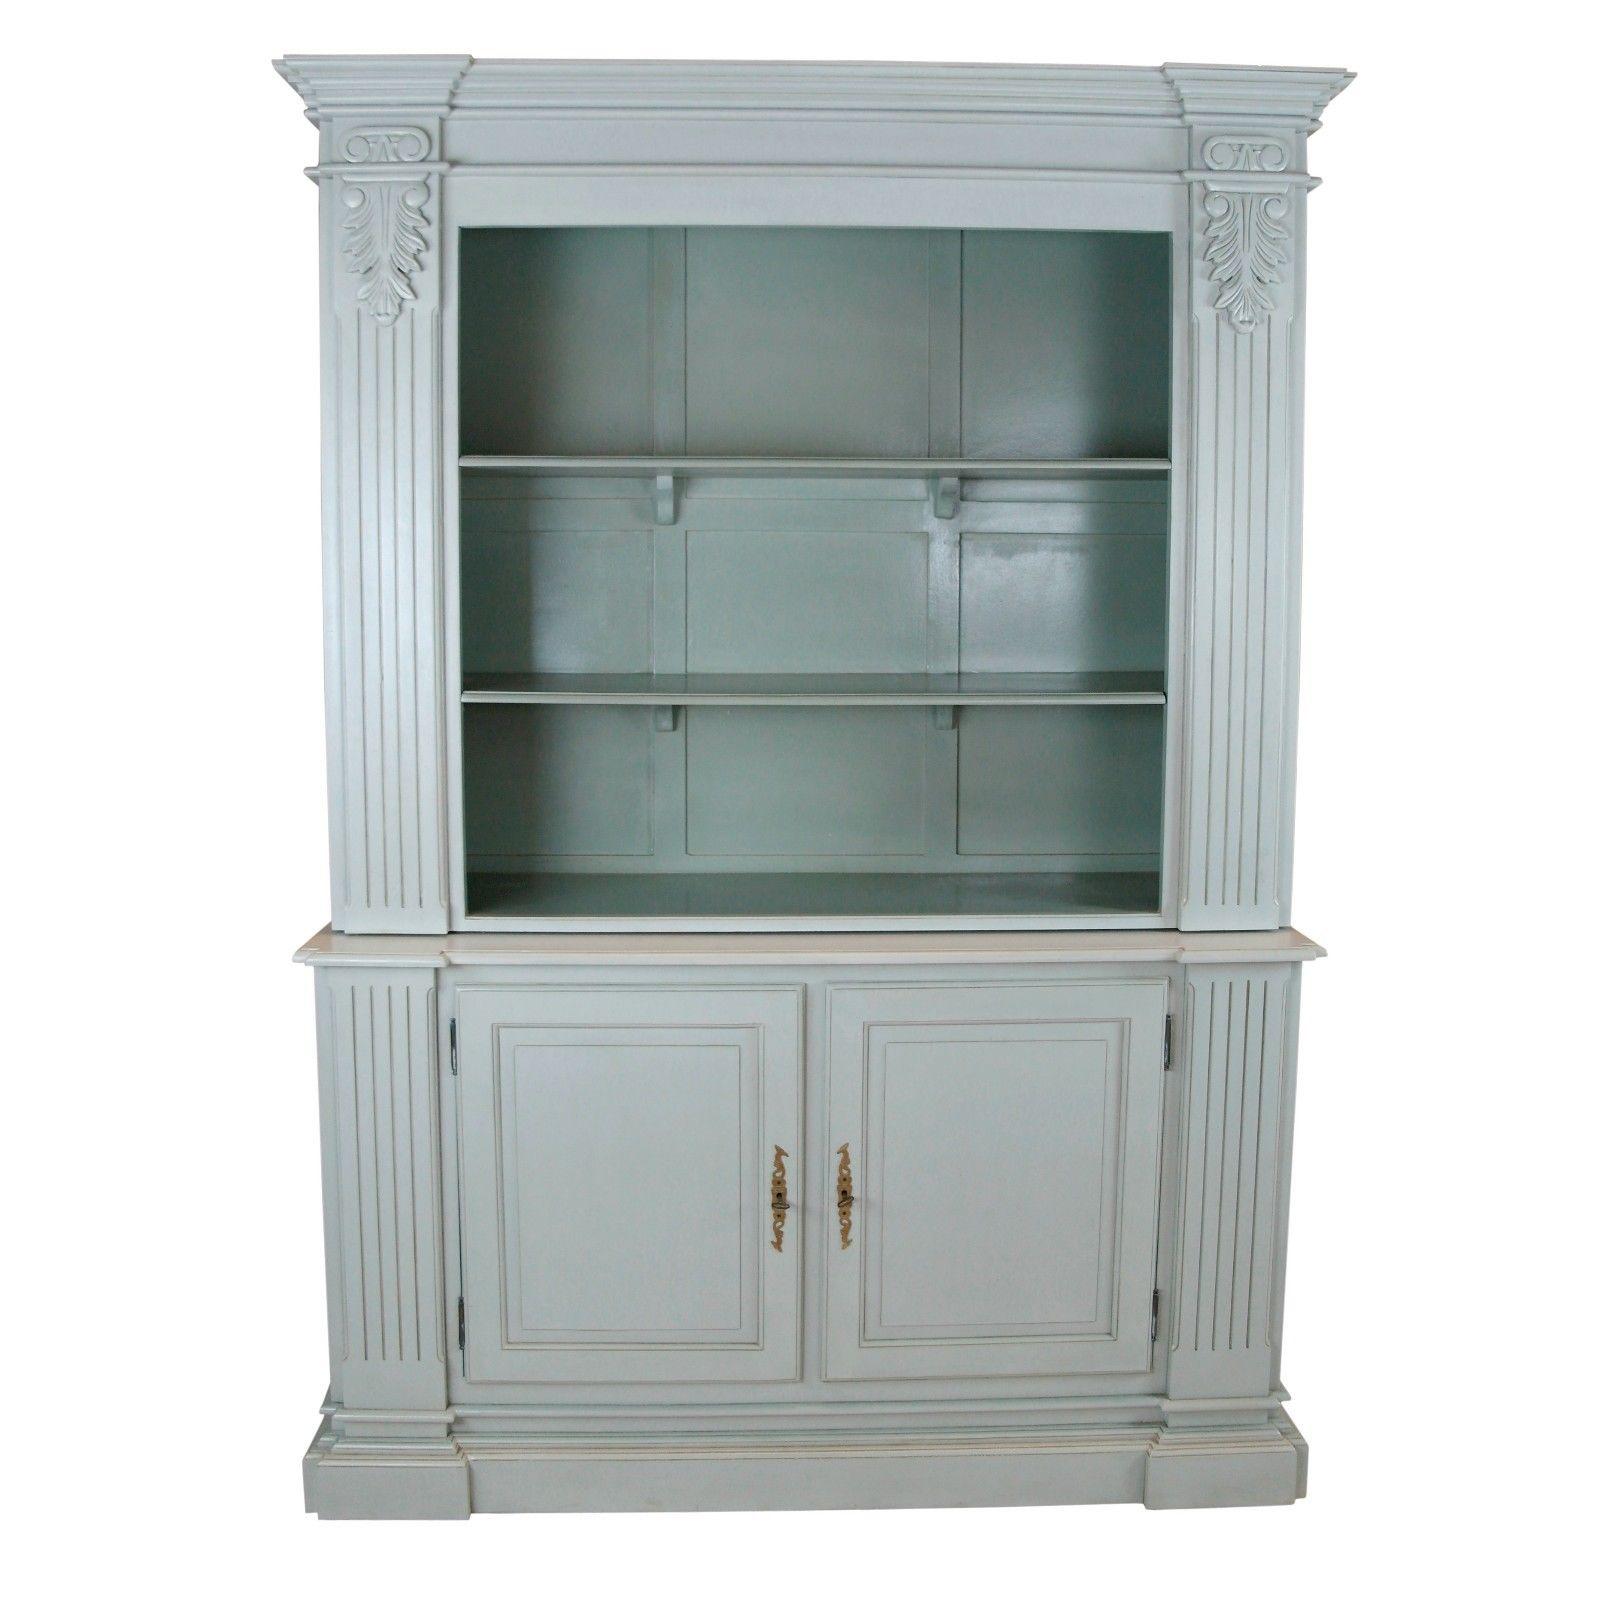 Large Grey Open Bookcase